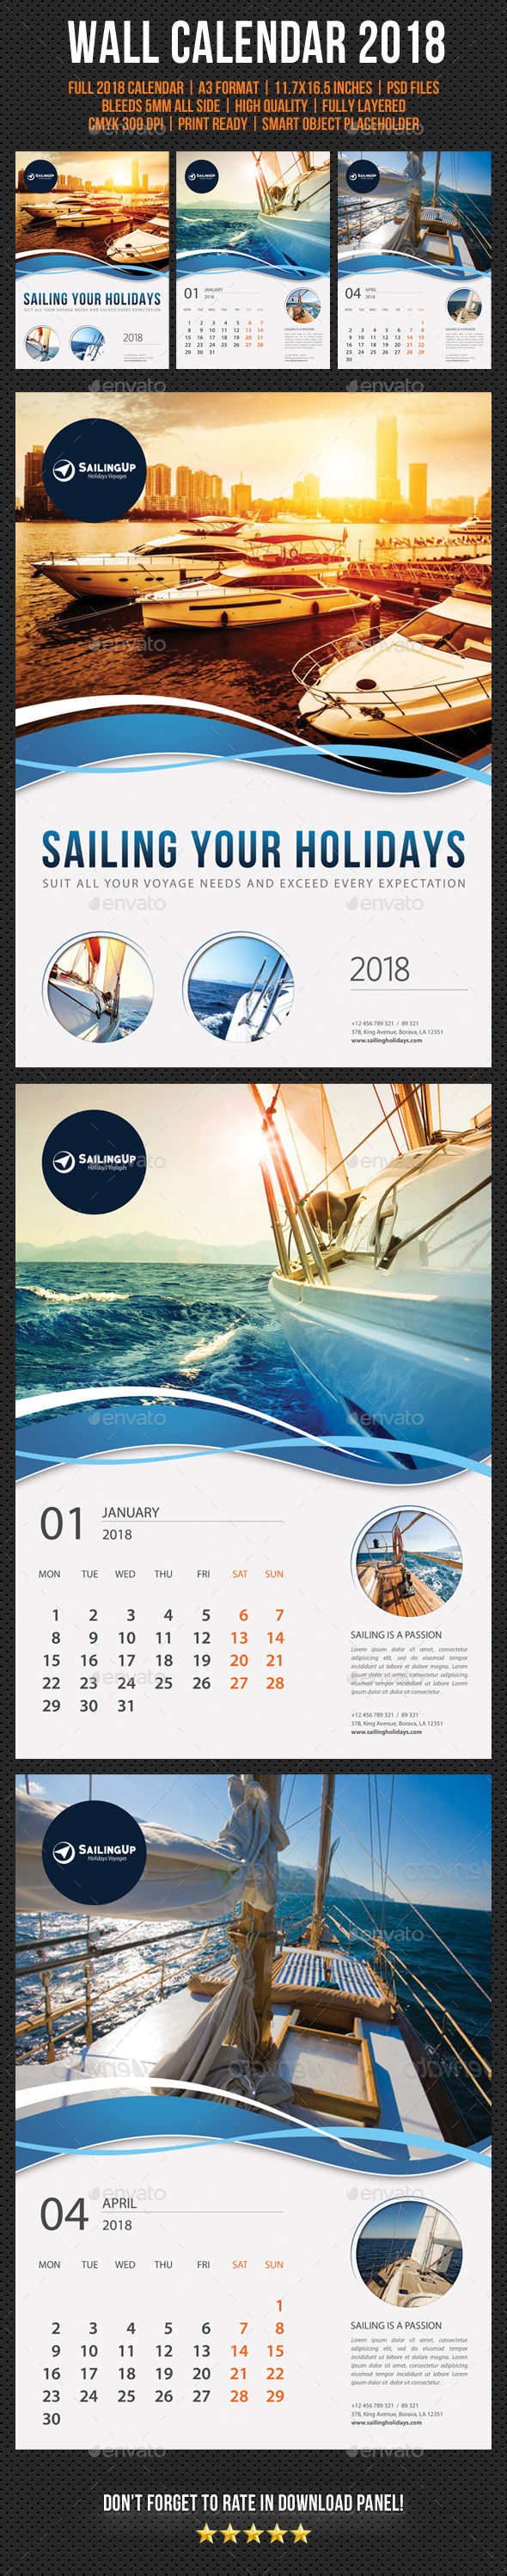 Wall Calendar 2018 V15 - Calendars Stationery